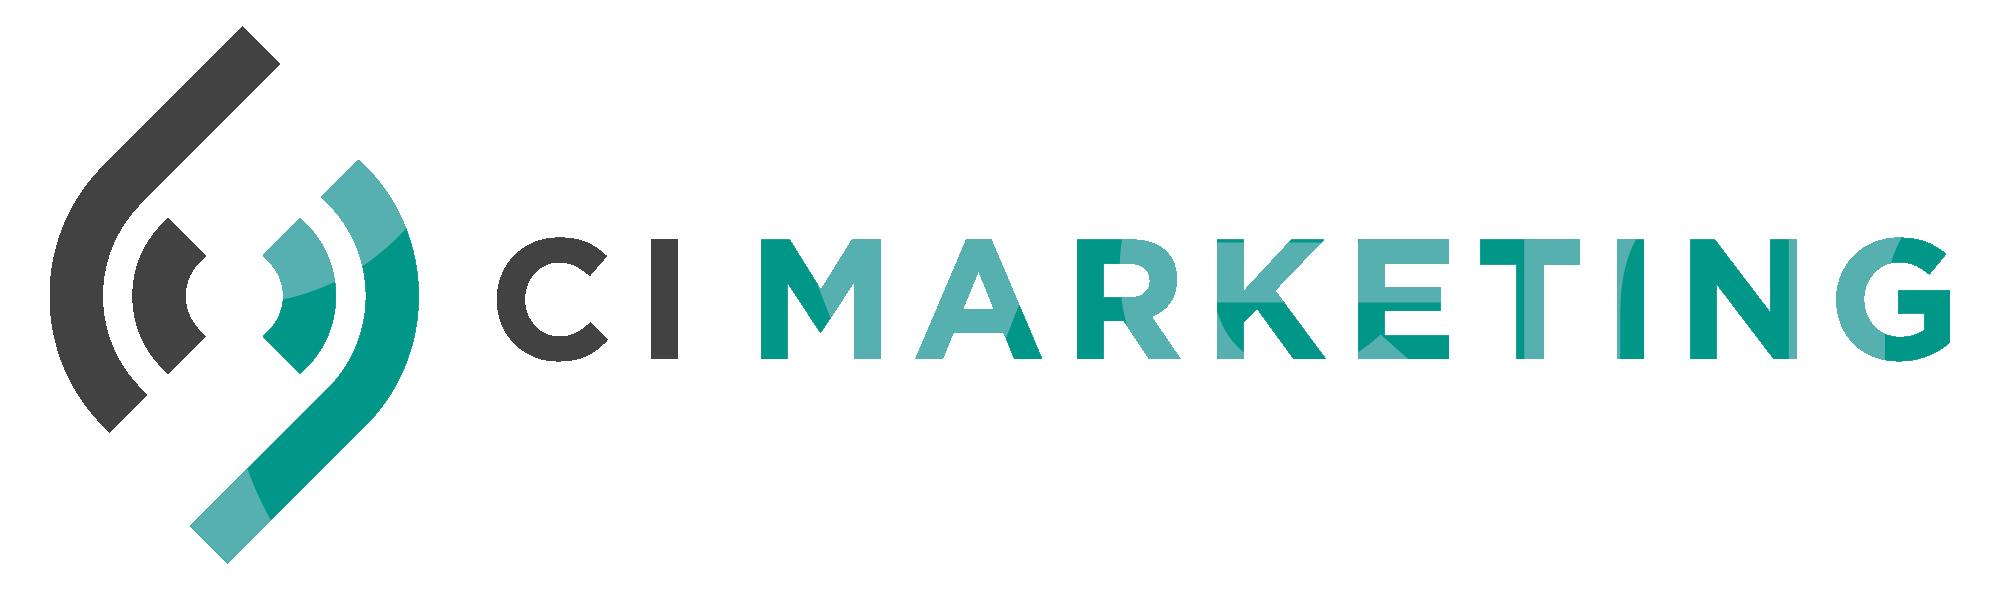 C I Marketing-01.png